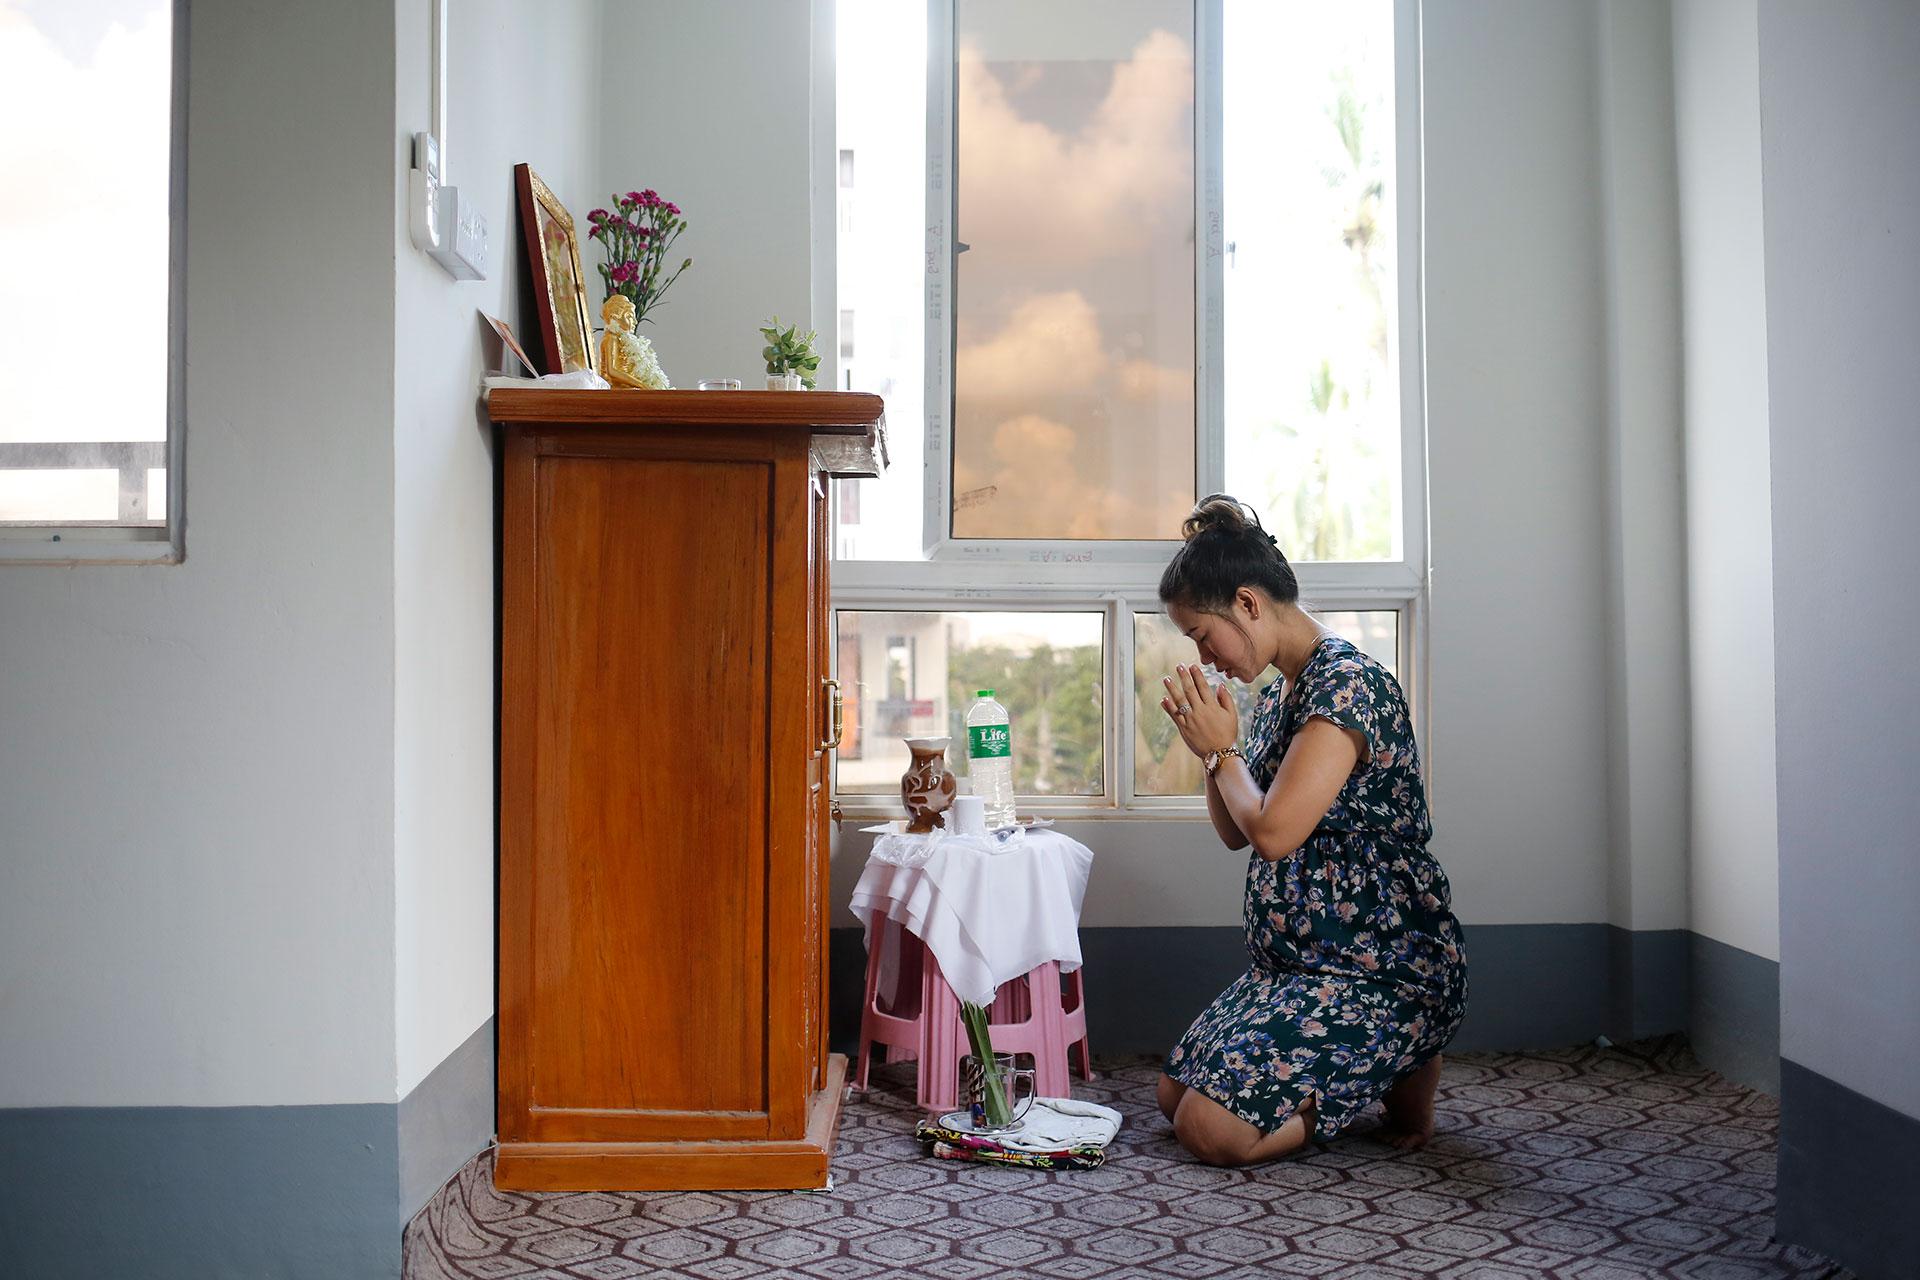 Dangerous News How Two Young Reporters Shook Myanmar